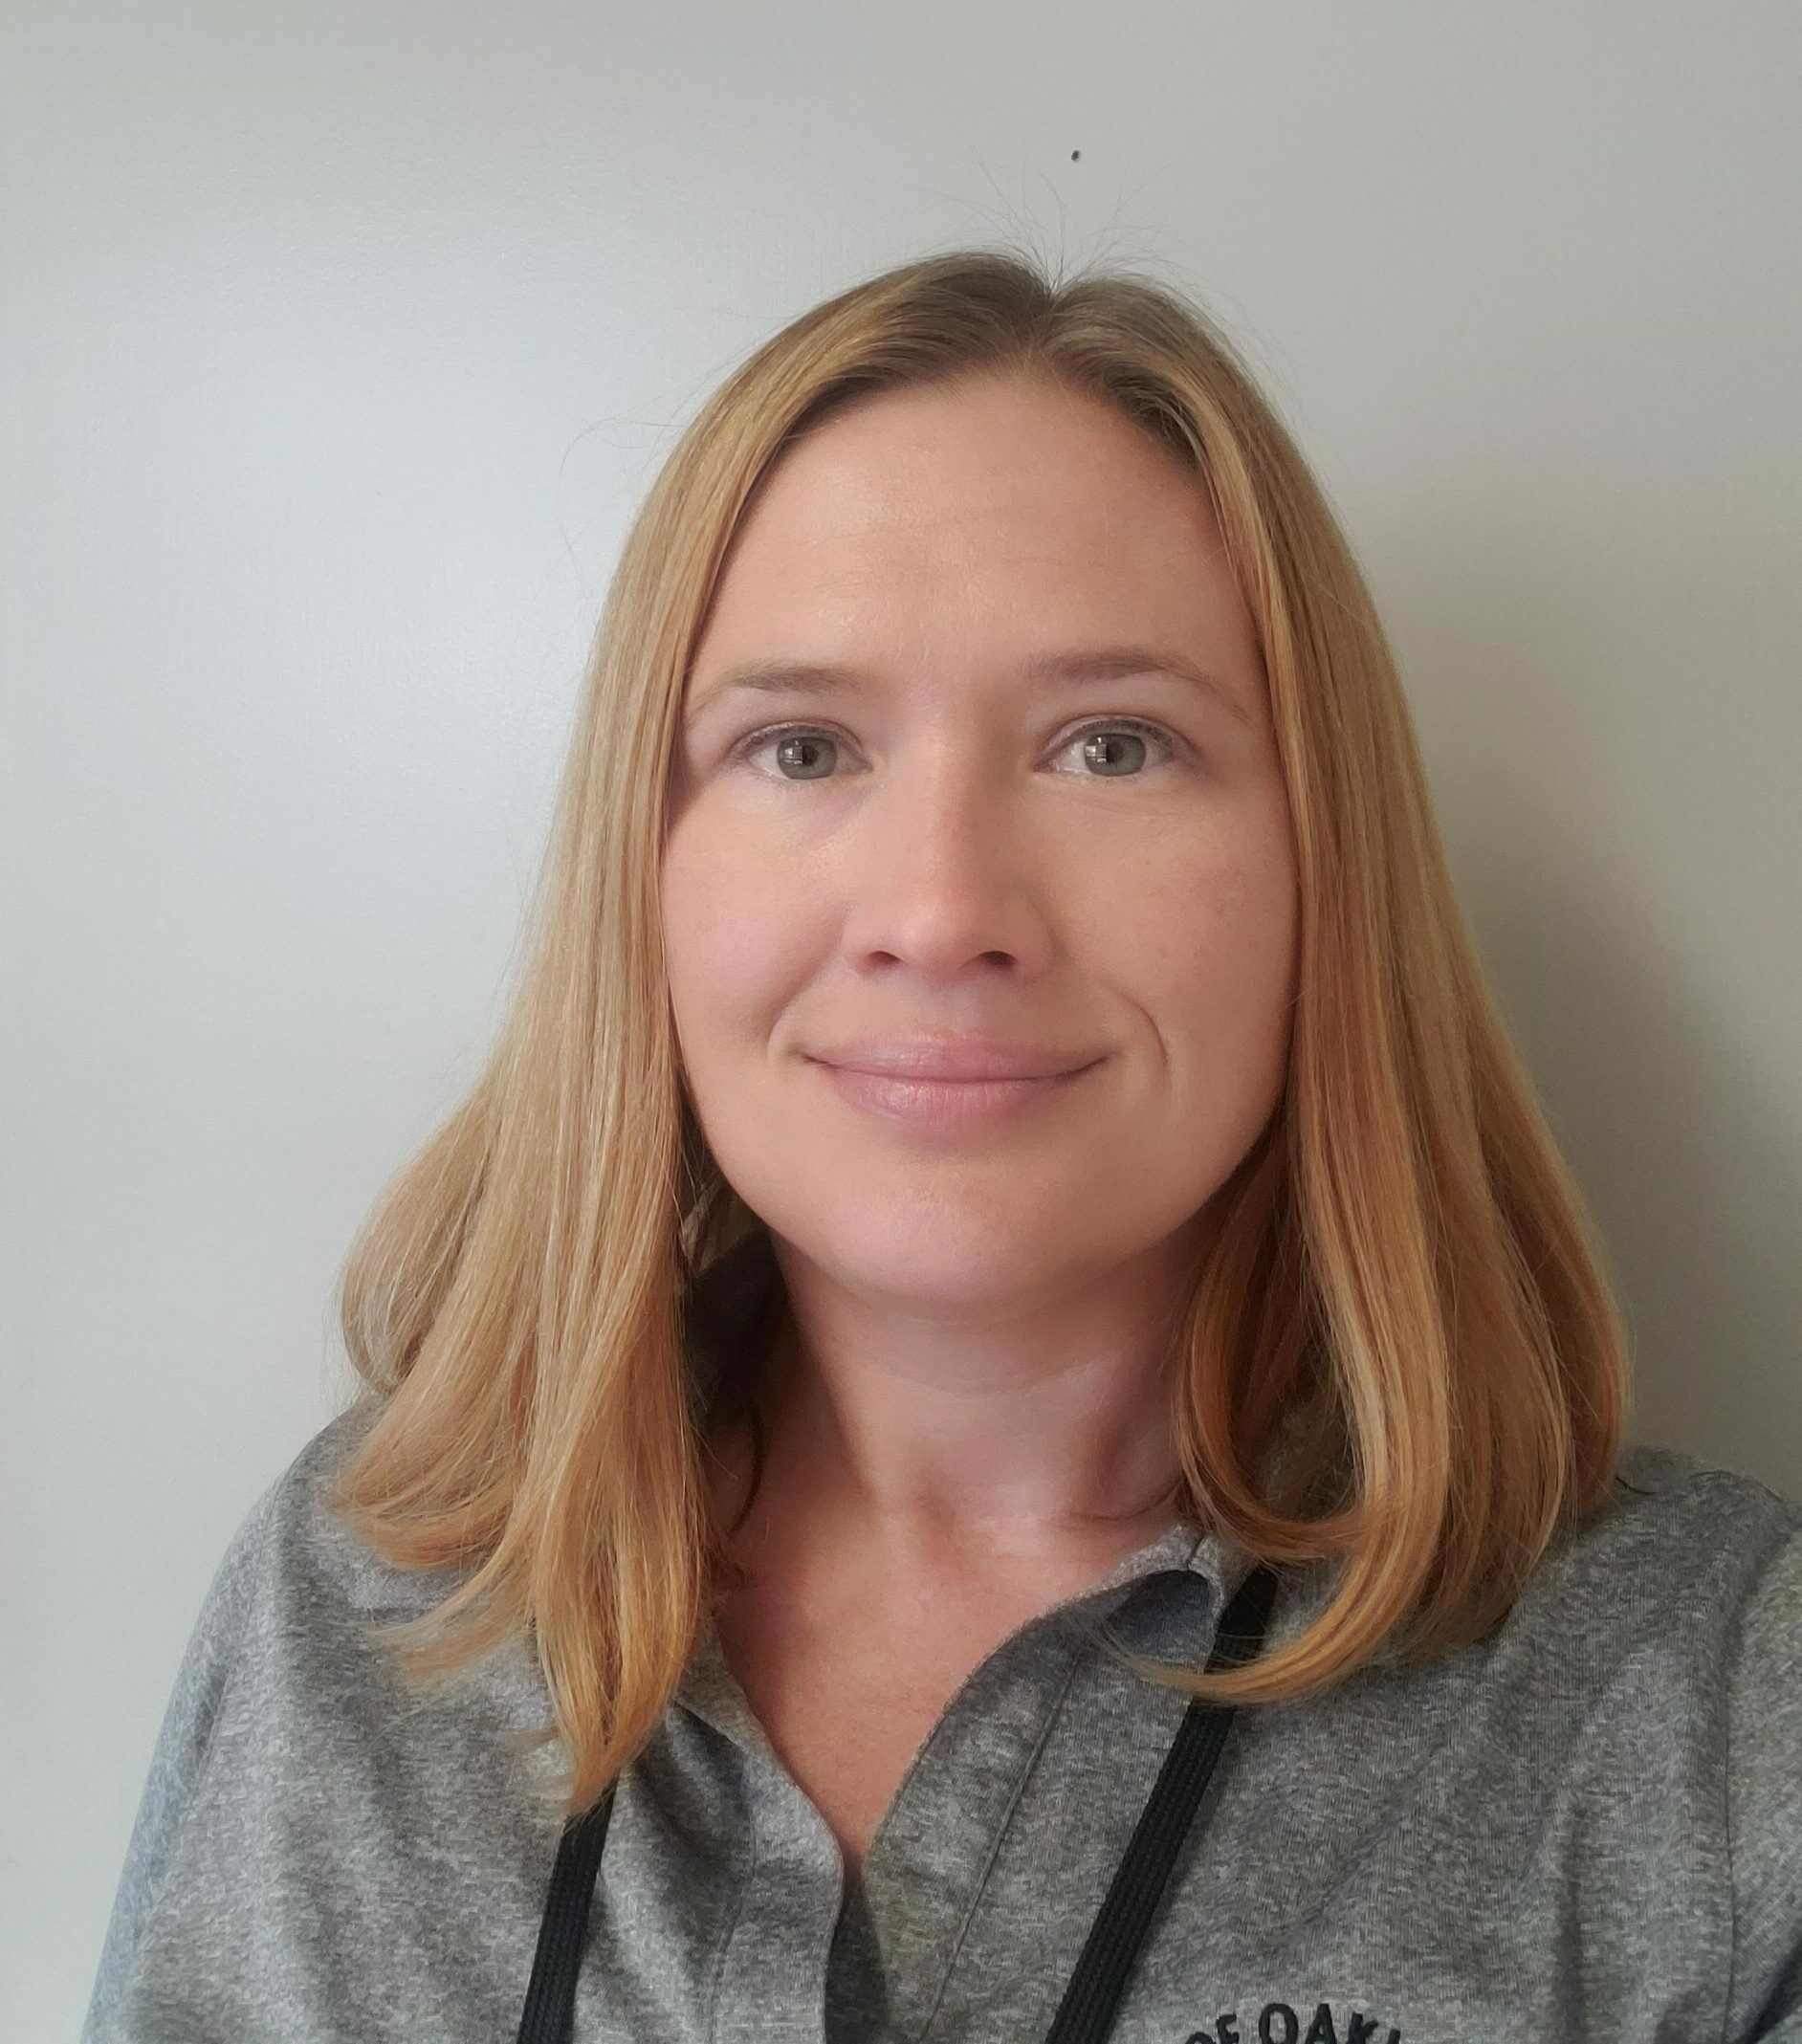 Portrait of Jessica Feil